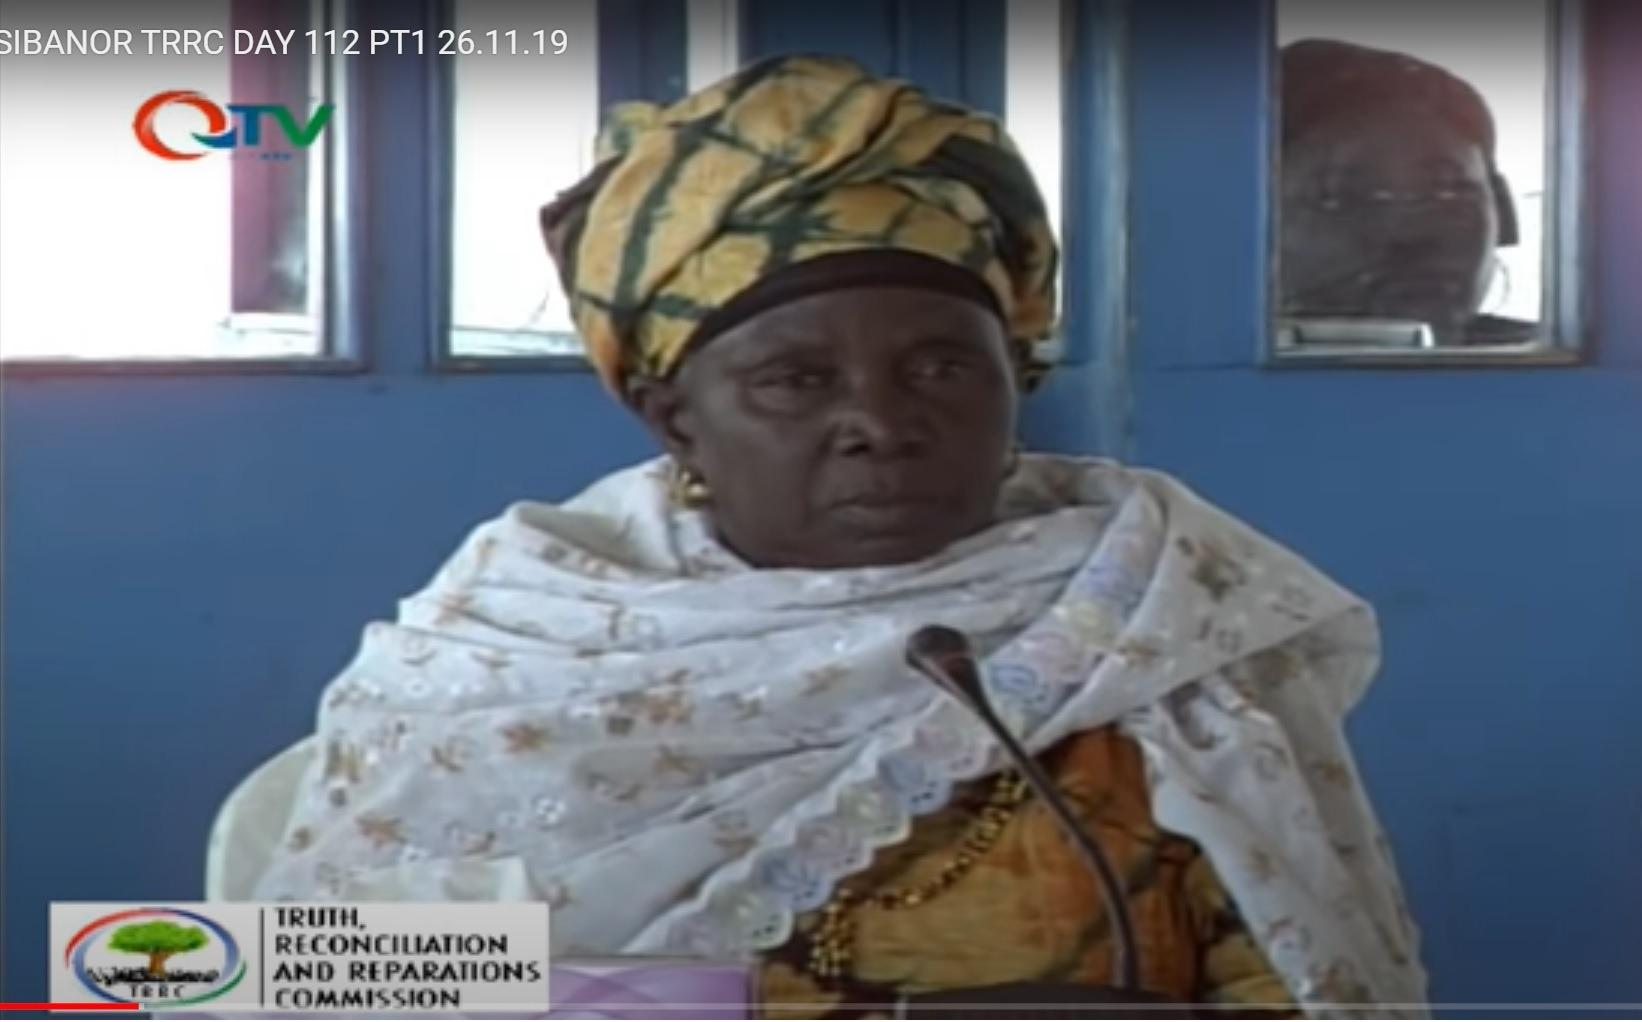 Fatu Camara testifying at the TRRC at Sibanor